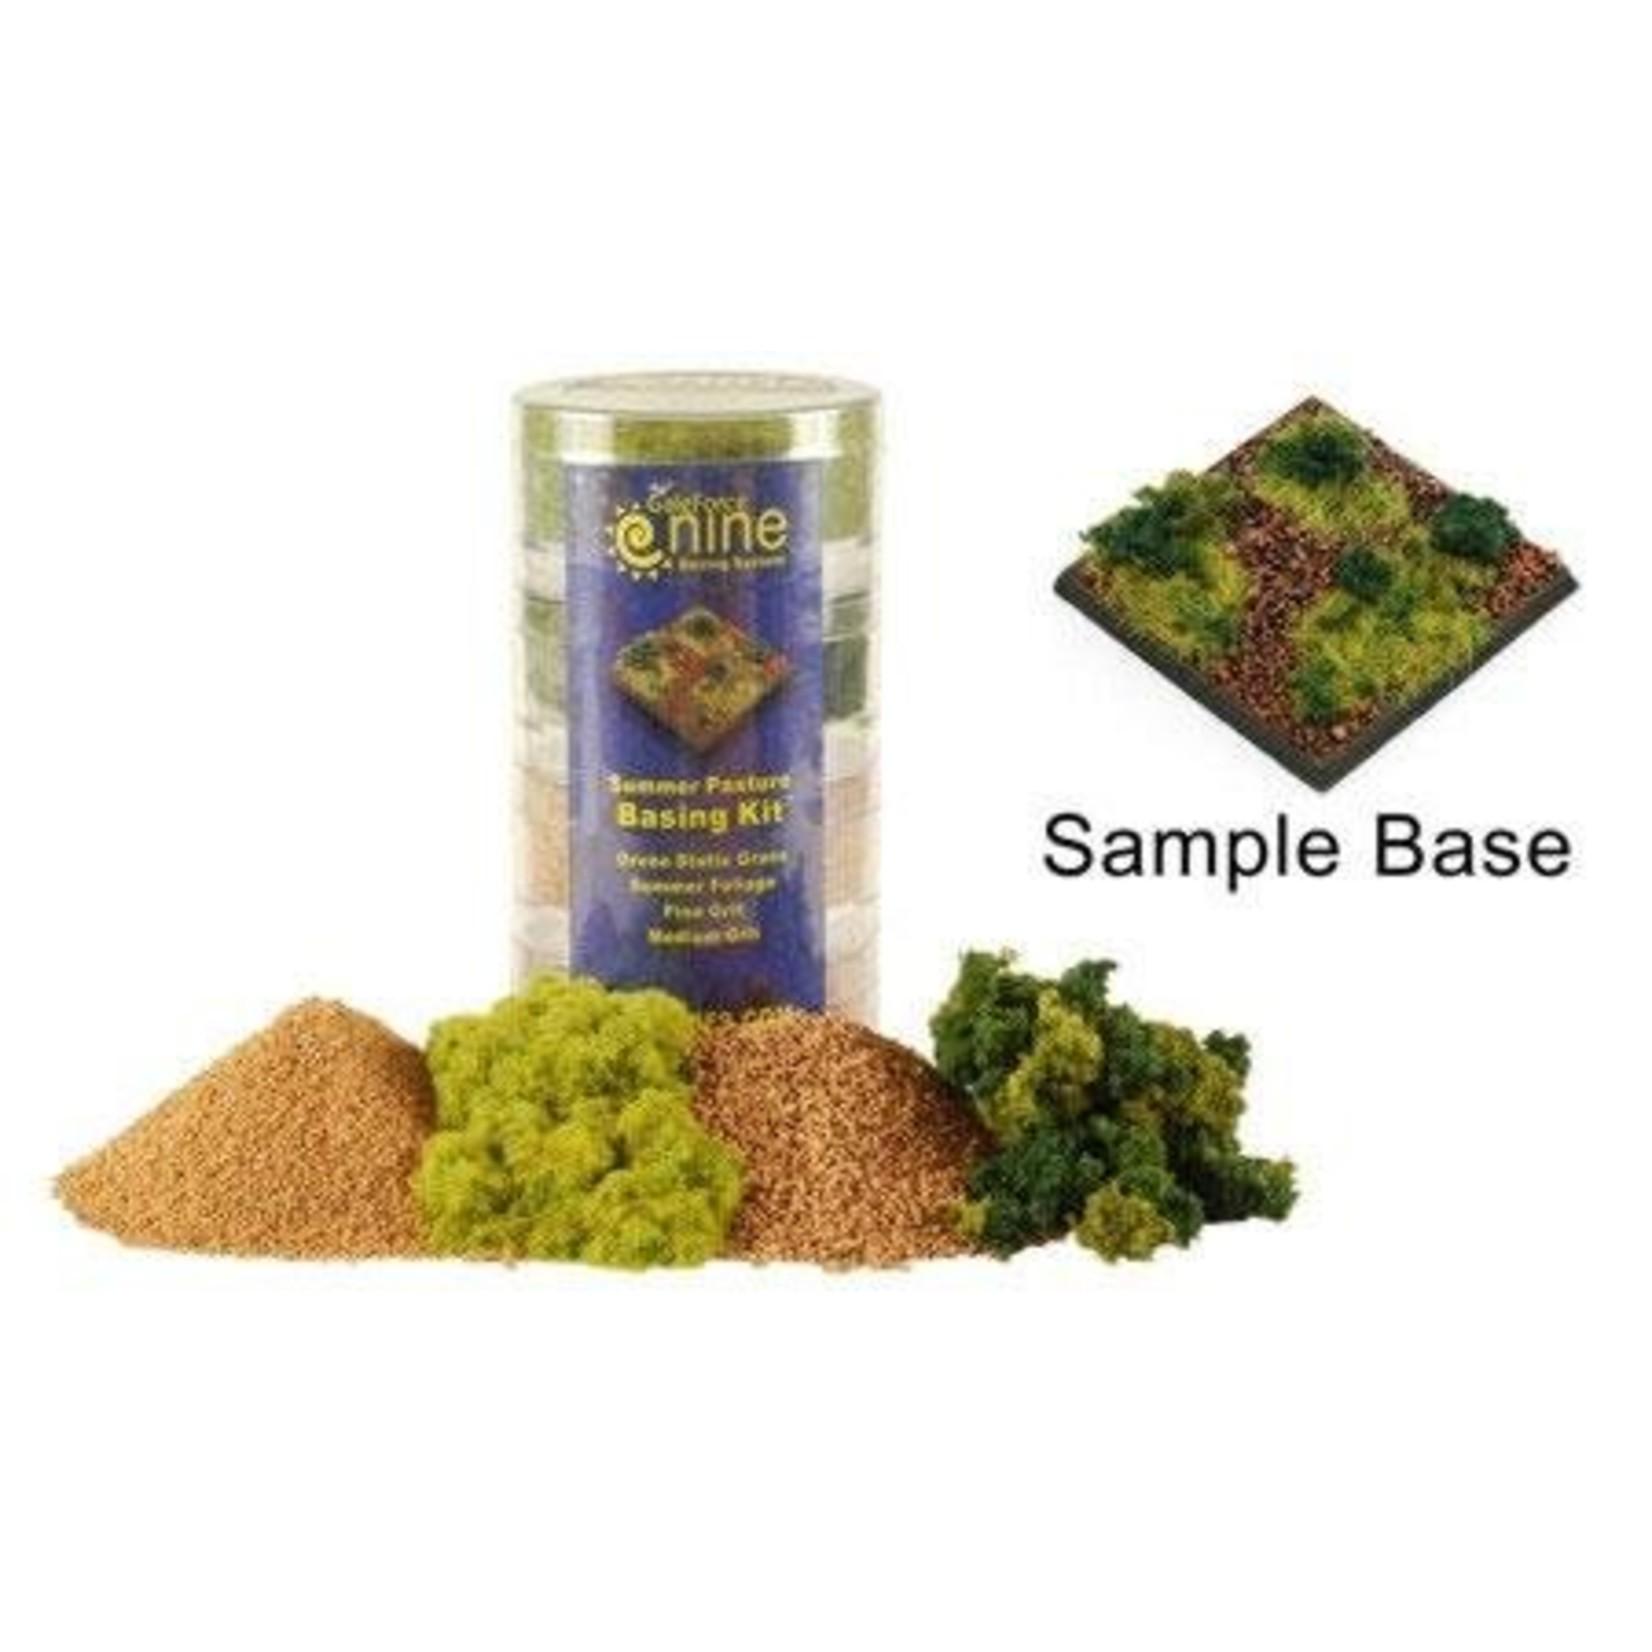 GaleForce9 Basing Kit: Summer Pasture